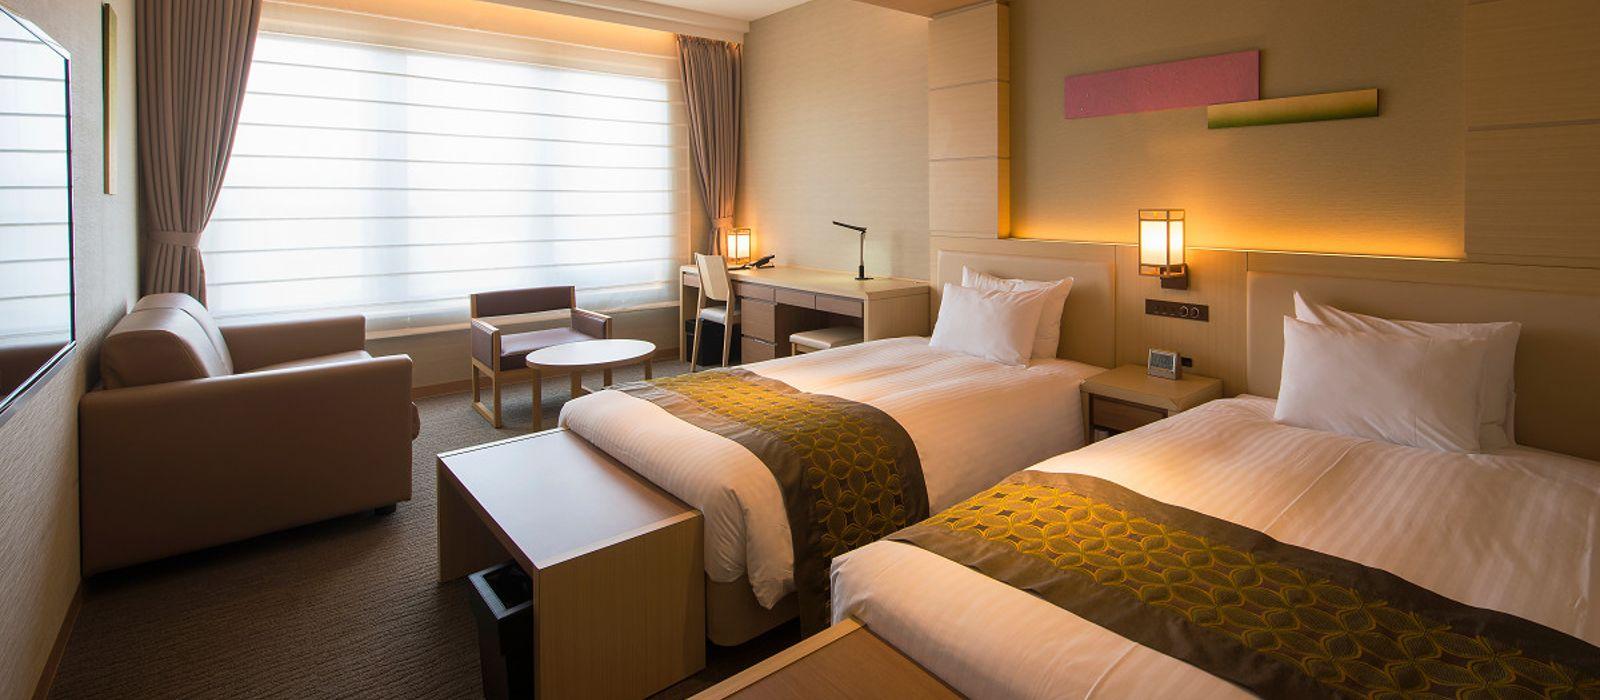 Hotel Kanazawa Sainoniwa  Japan